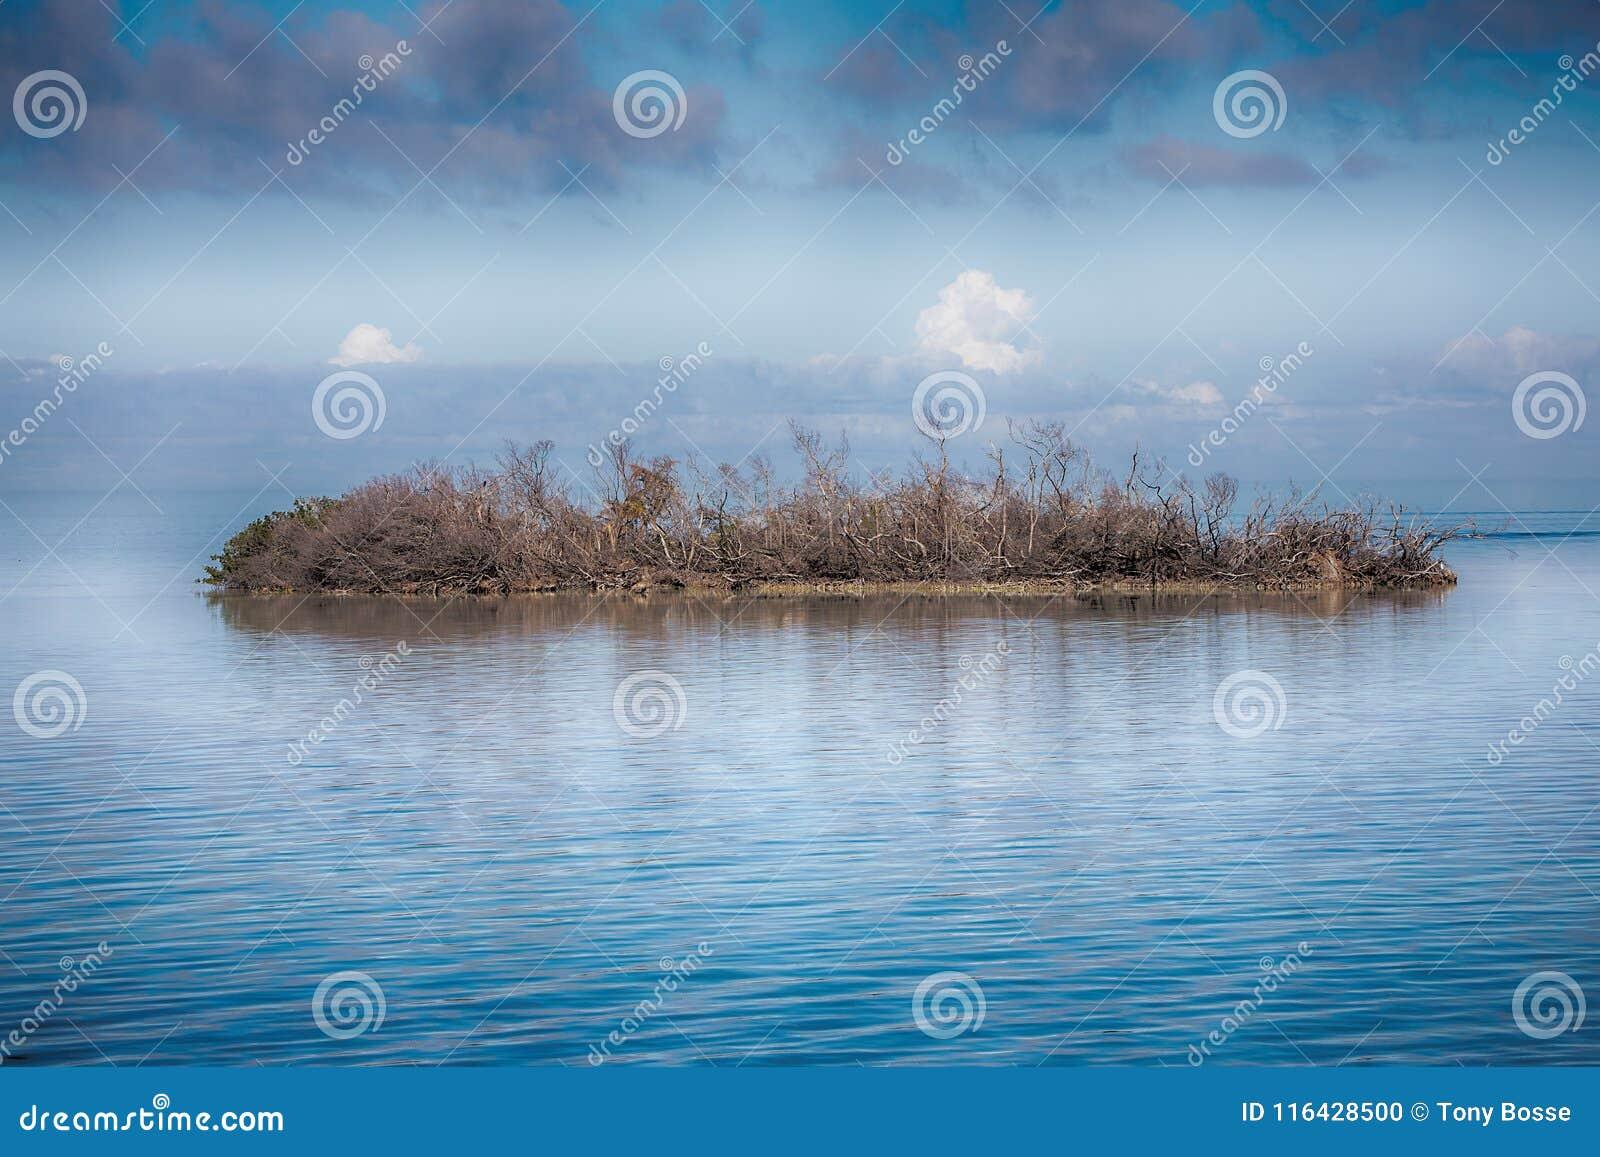 Abandoned, Desolate Island stock photo  Image of environment - 116428500